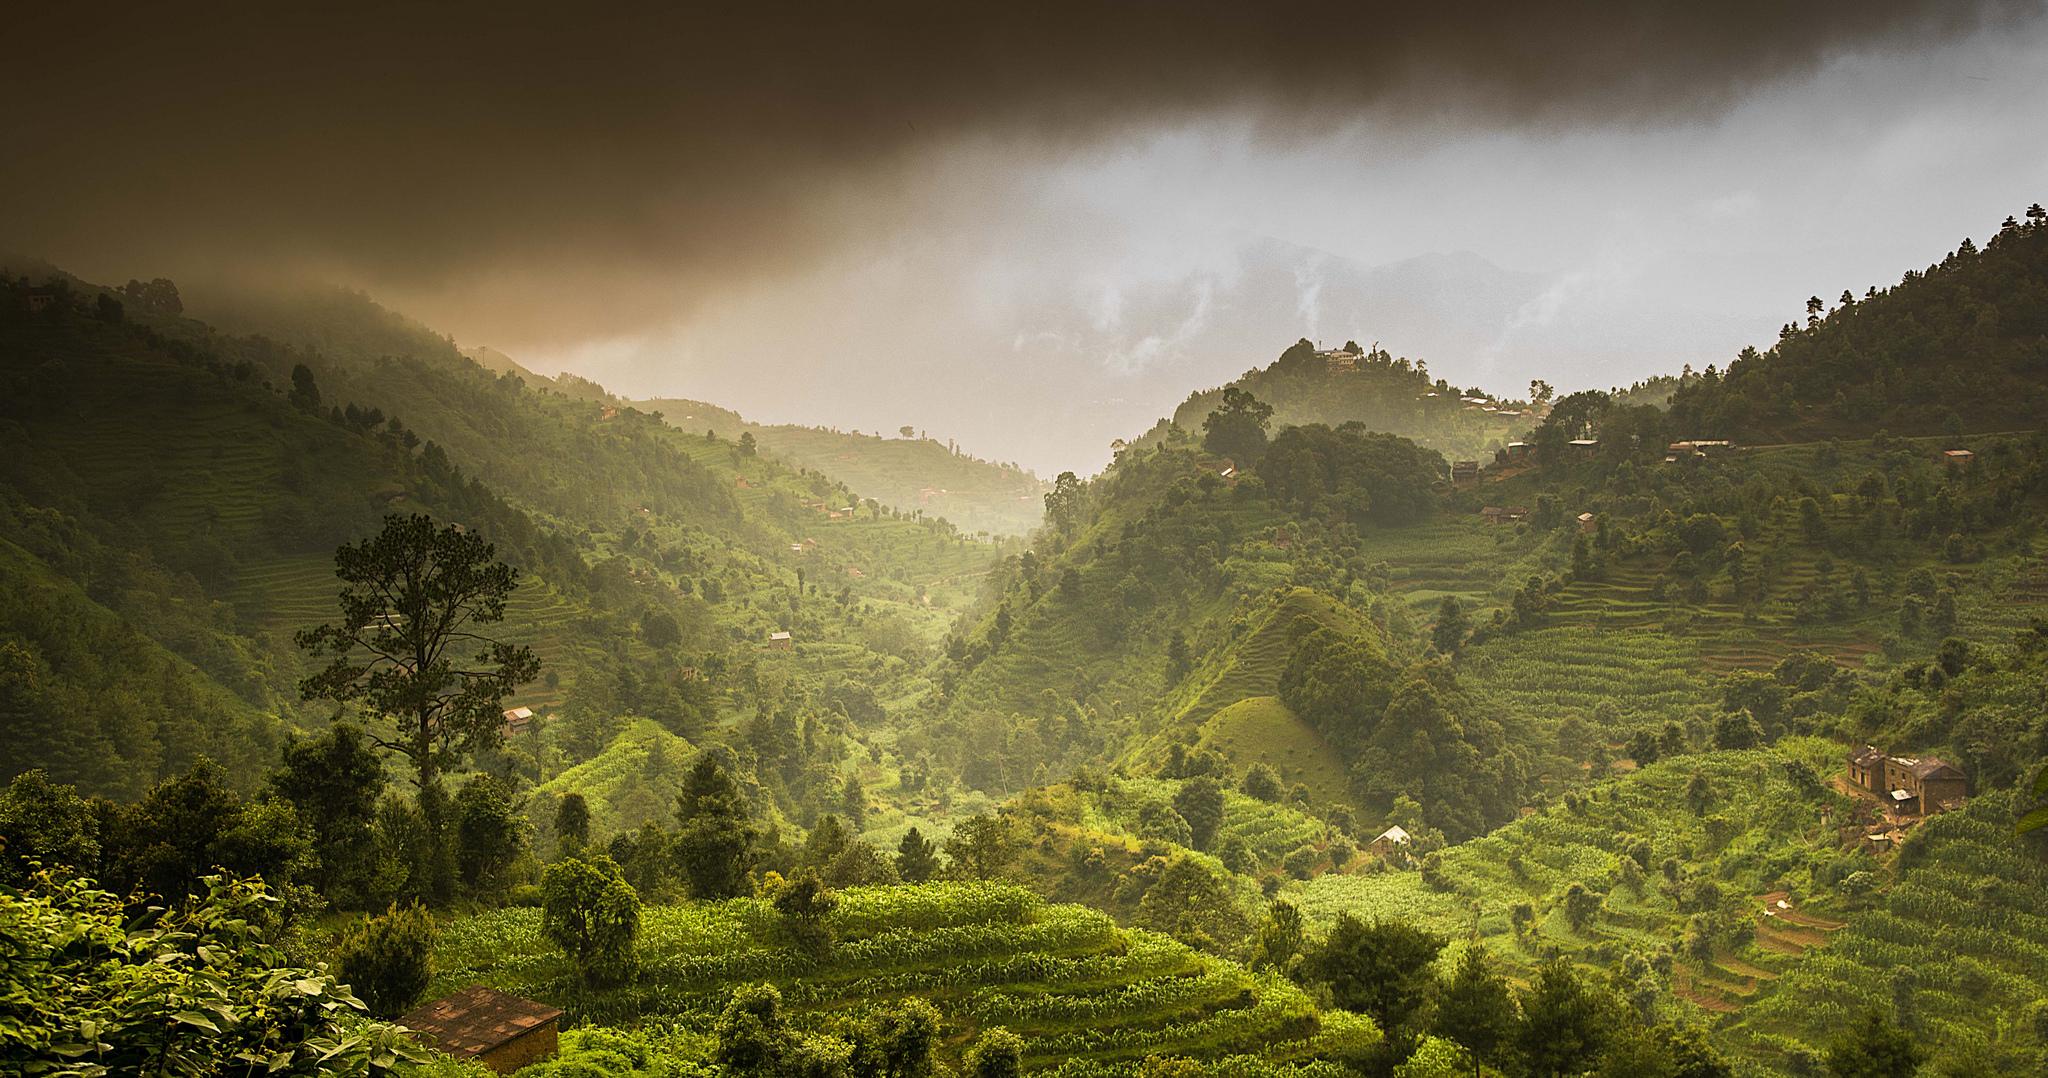 Mountains and Rice fields of Nepal_Sharada Prasad